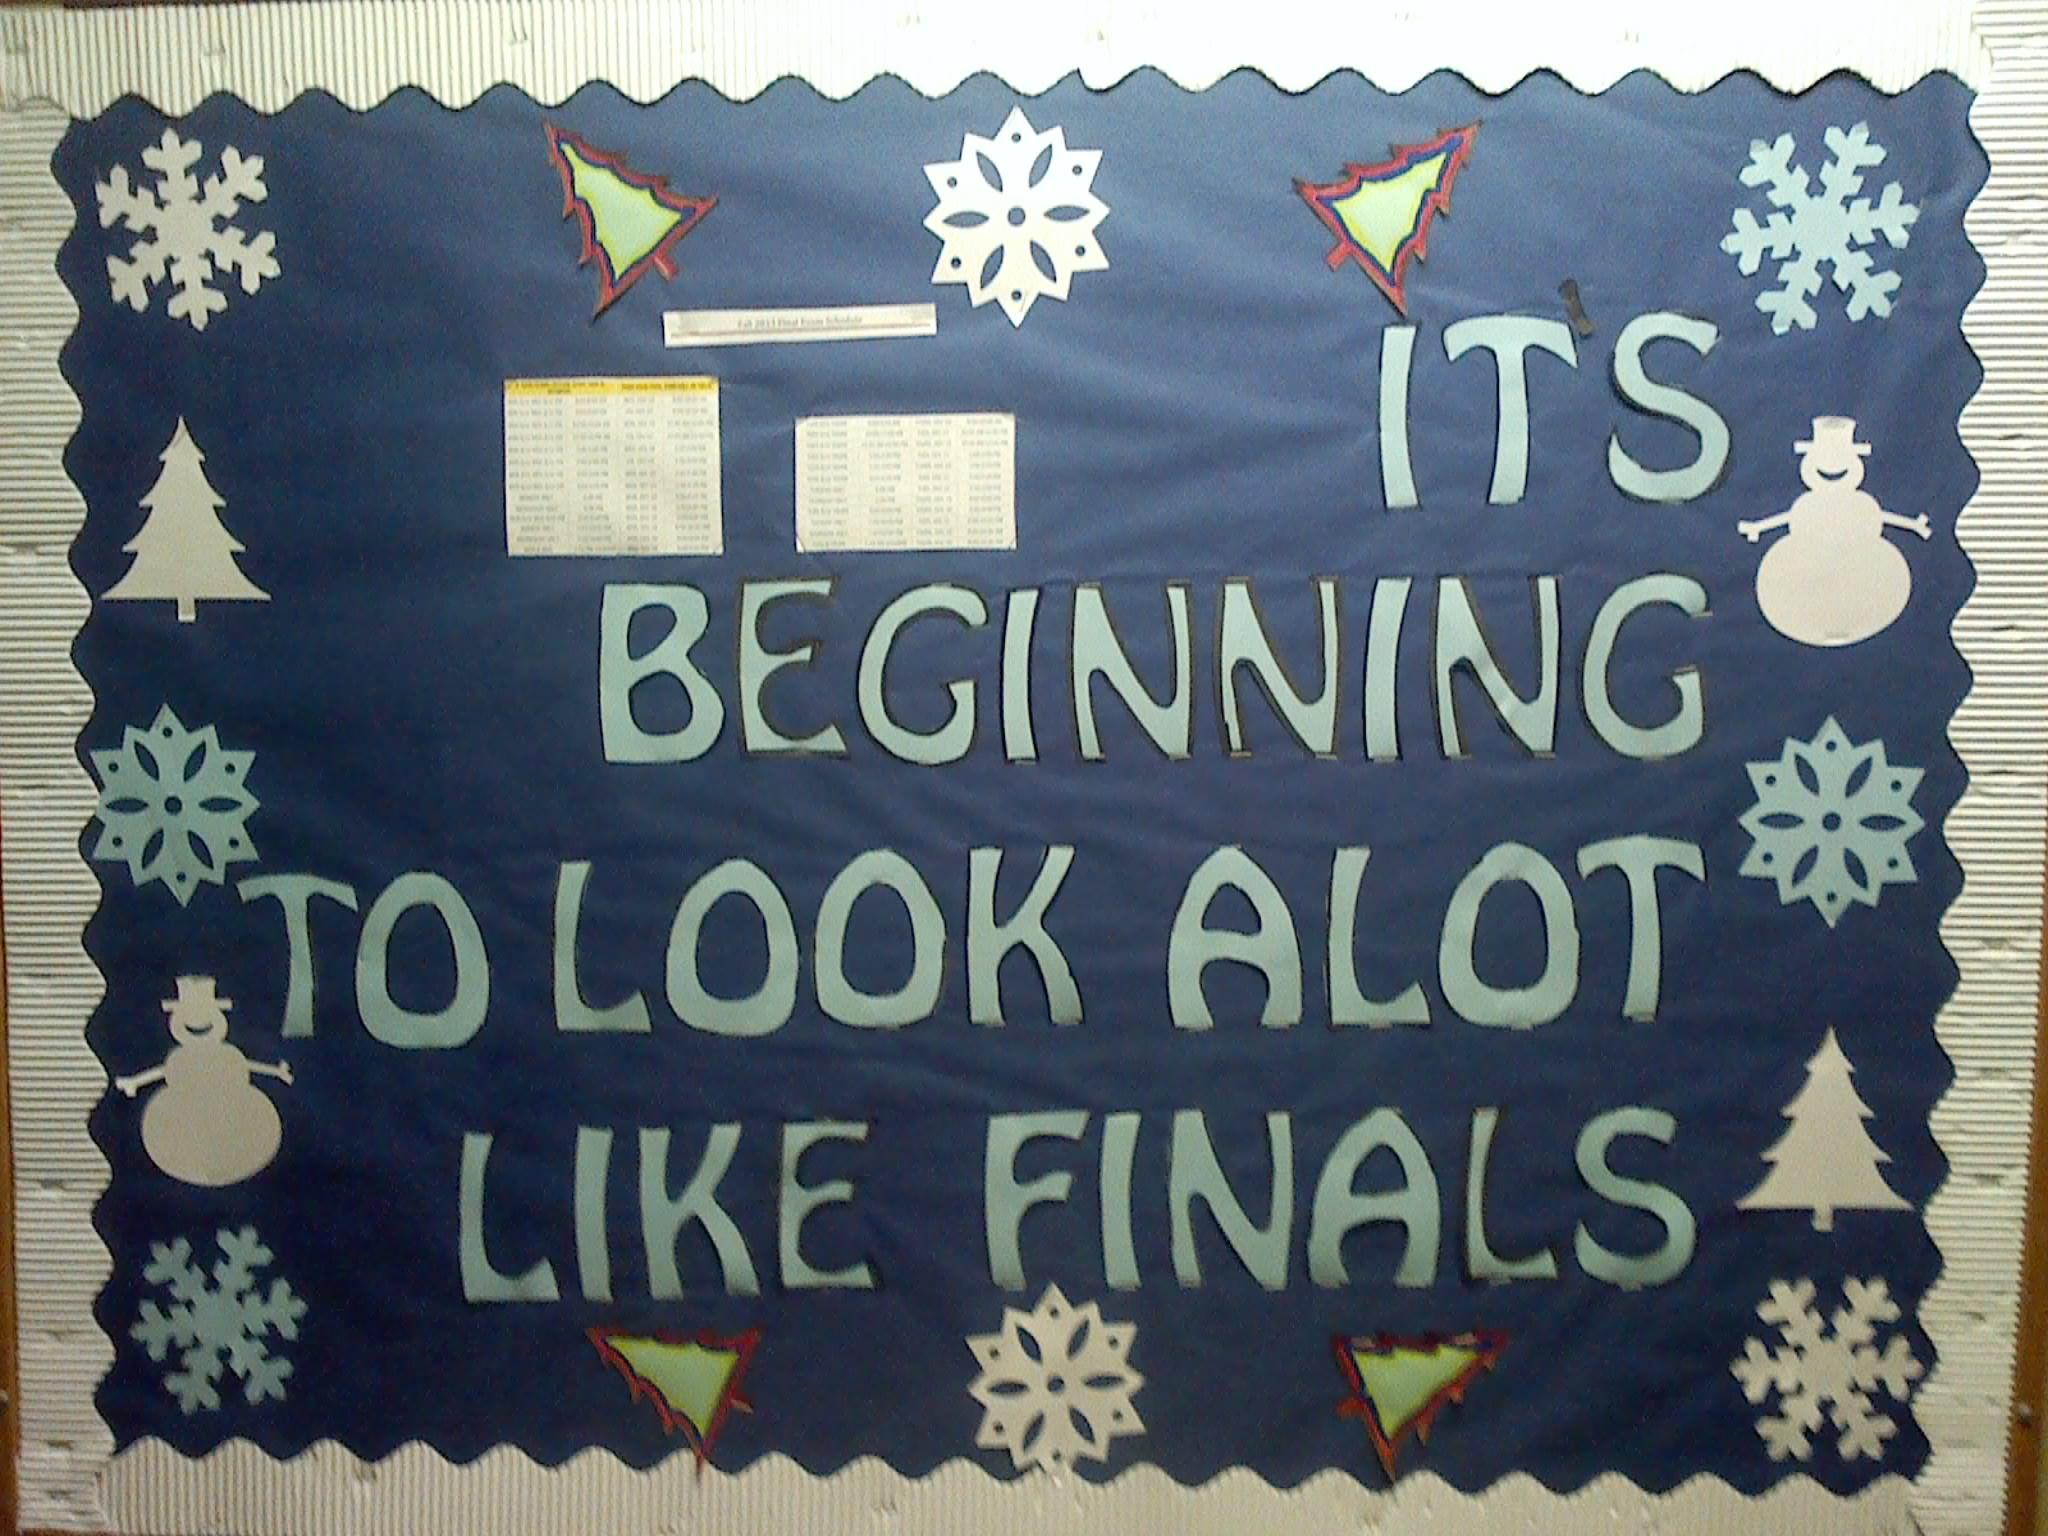 Winter bulletin boards ideas pinterest - Ra Bulletin Board It S Beginning To Look Alot Like Finals Creative Way Post The